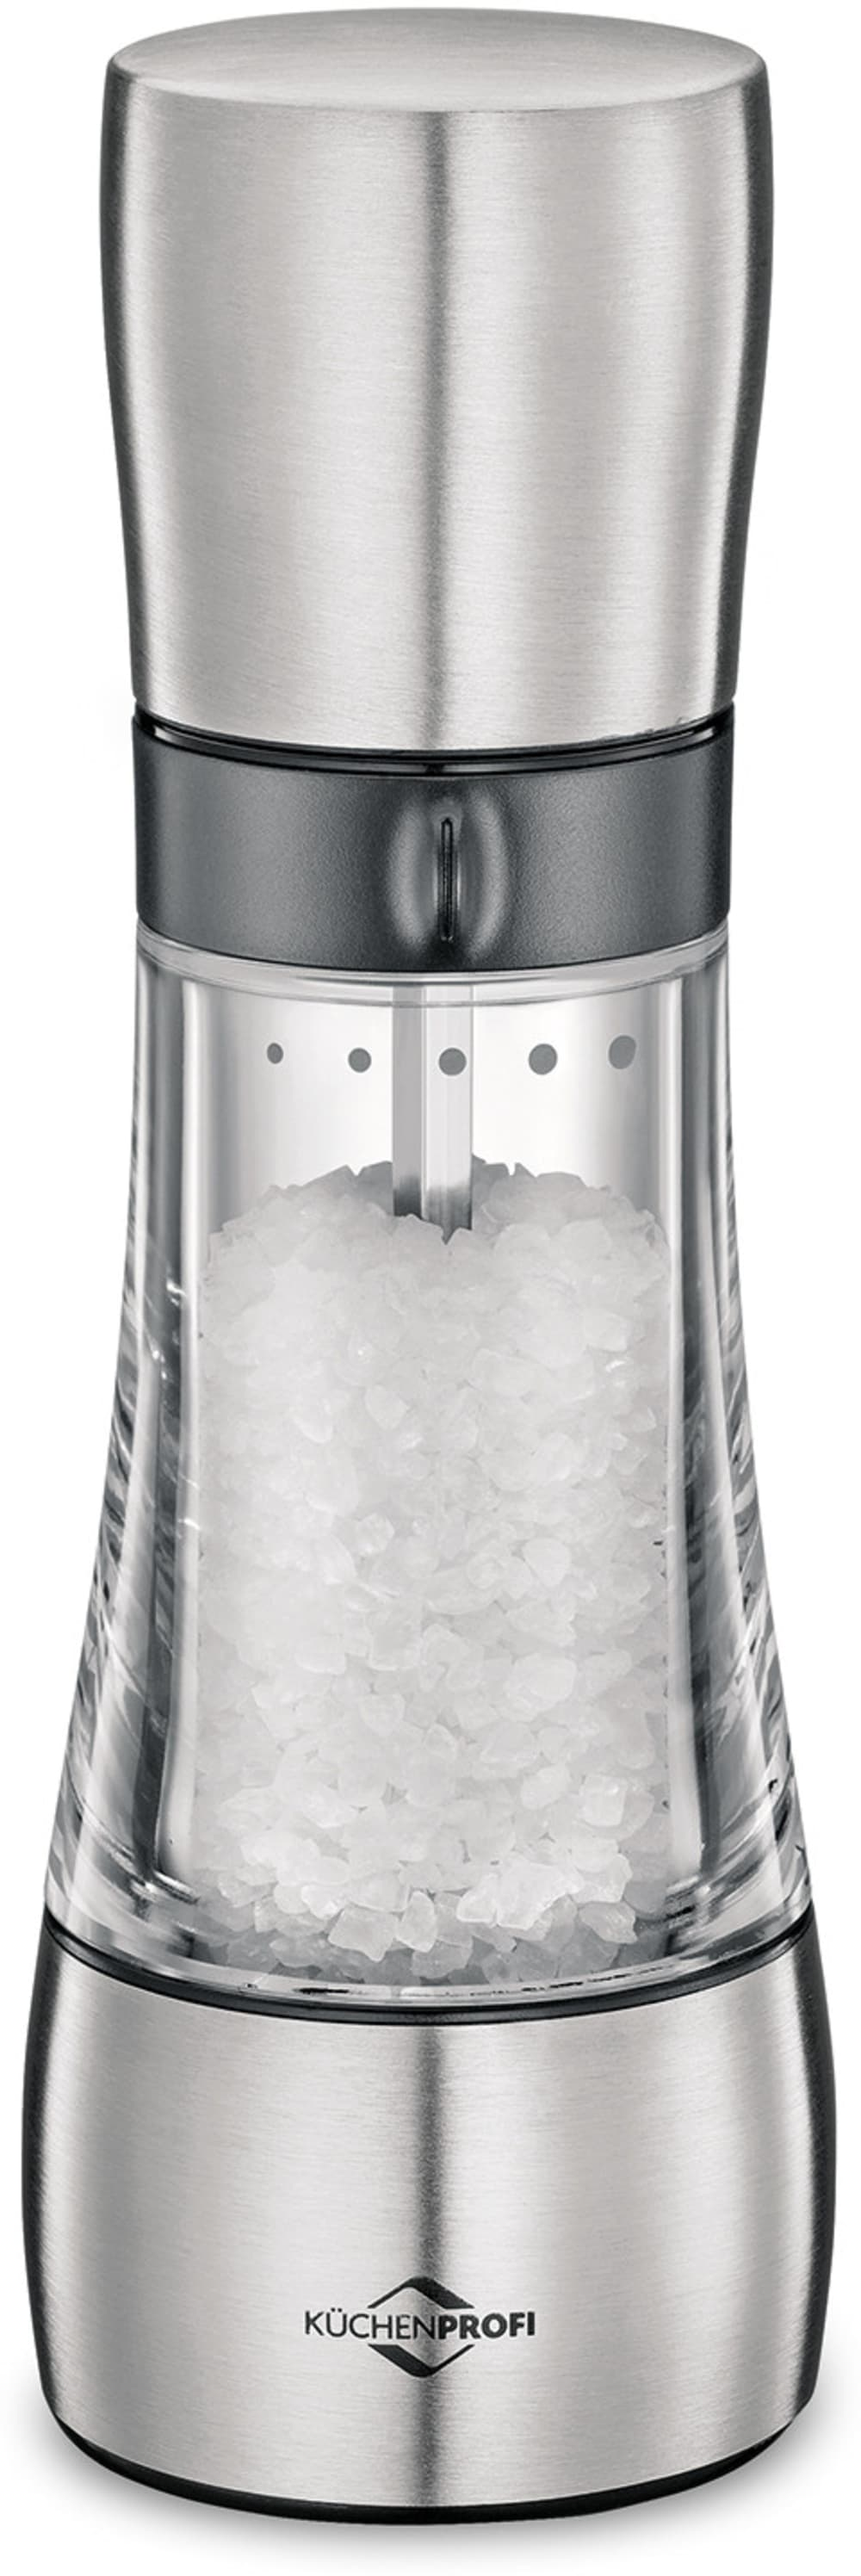 Młynek do soli, śred. 6 x 18,5 cm